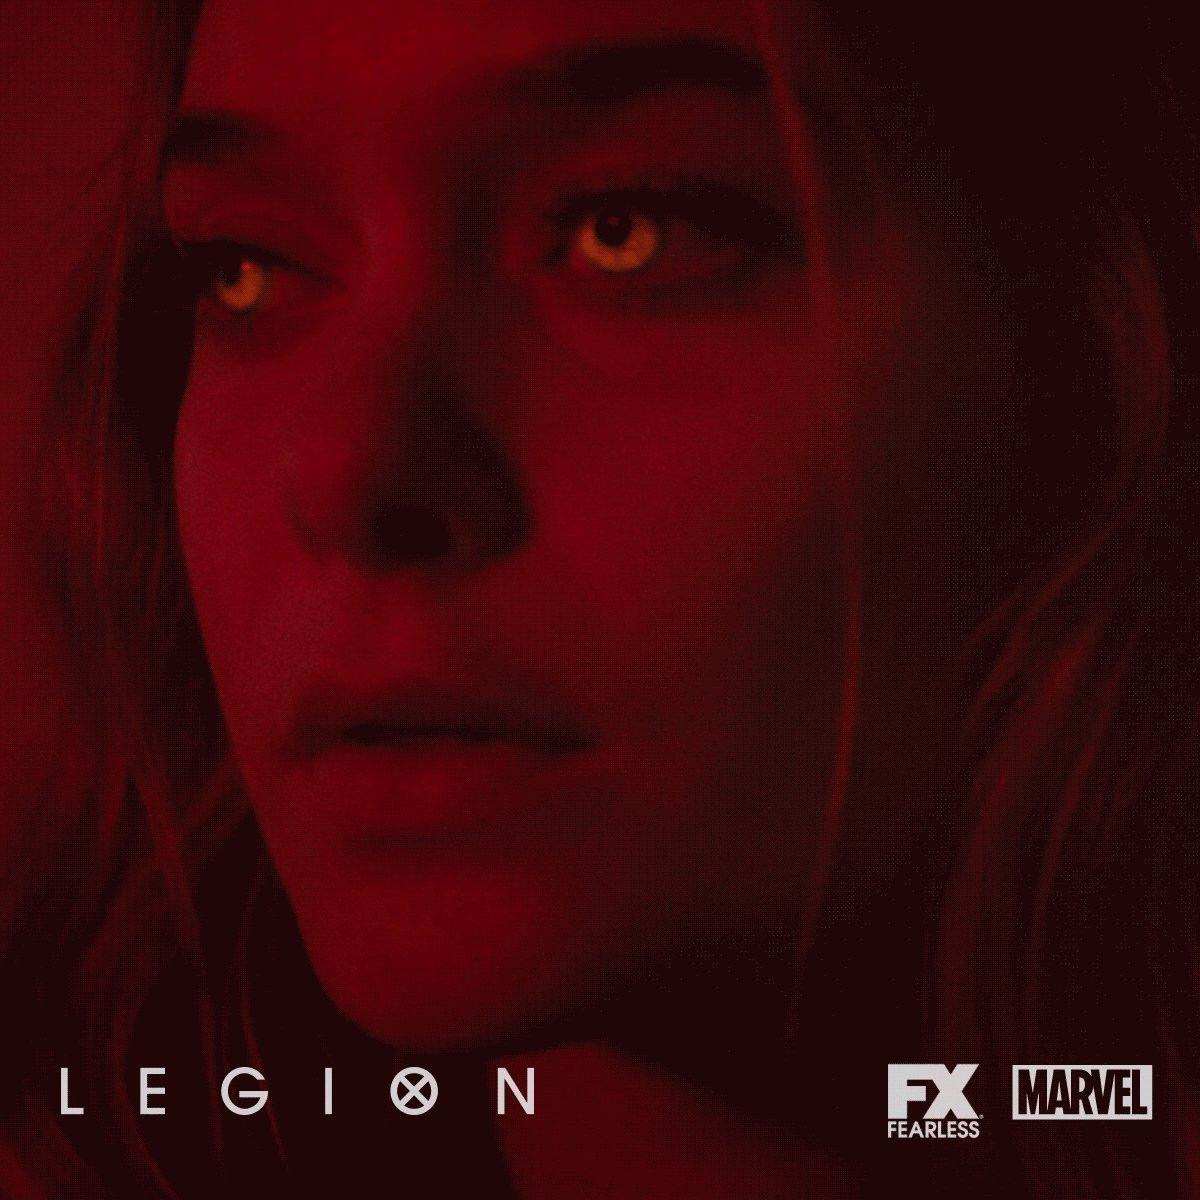 Pretty possessed. #LegionFX https://t.co/ic7xnch1dm